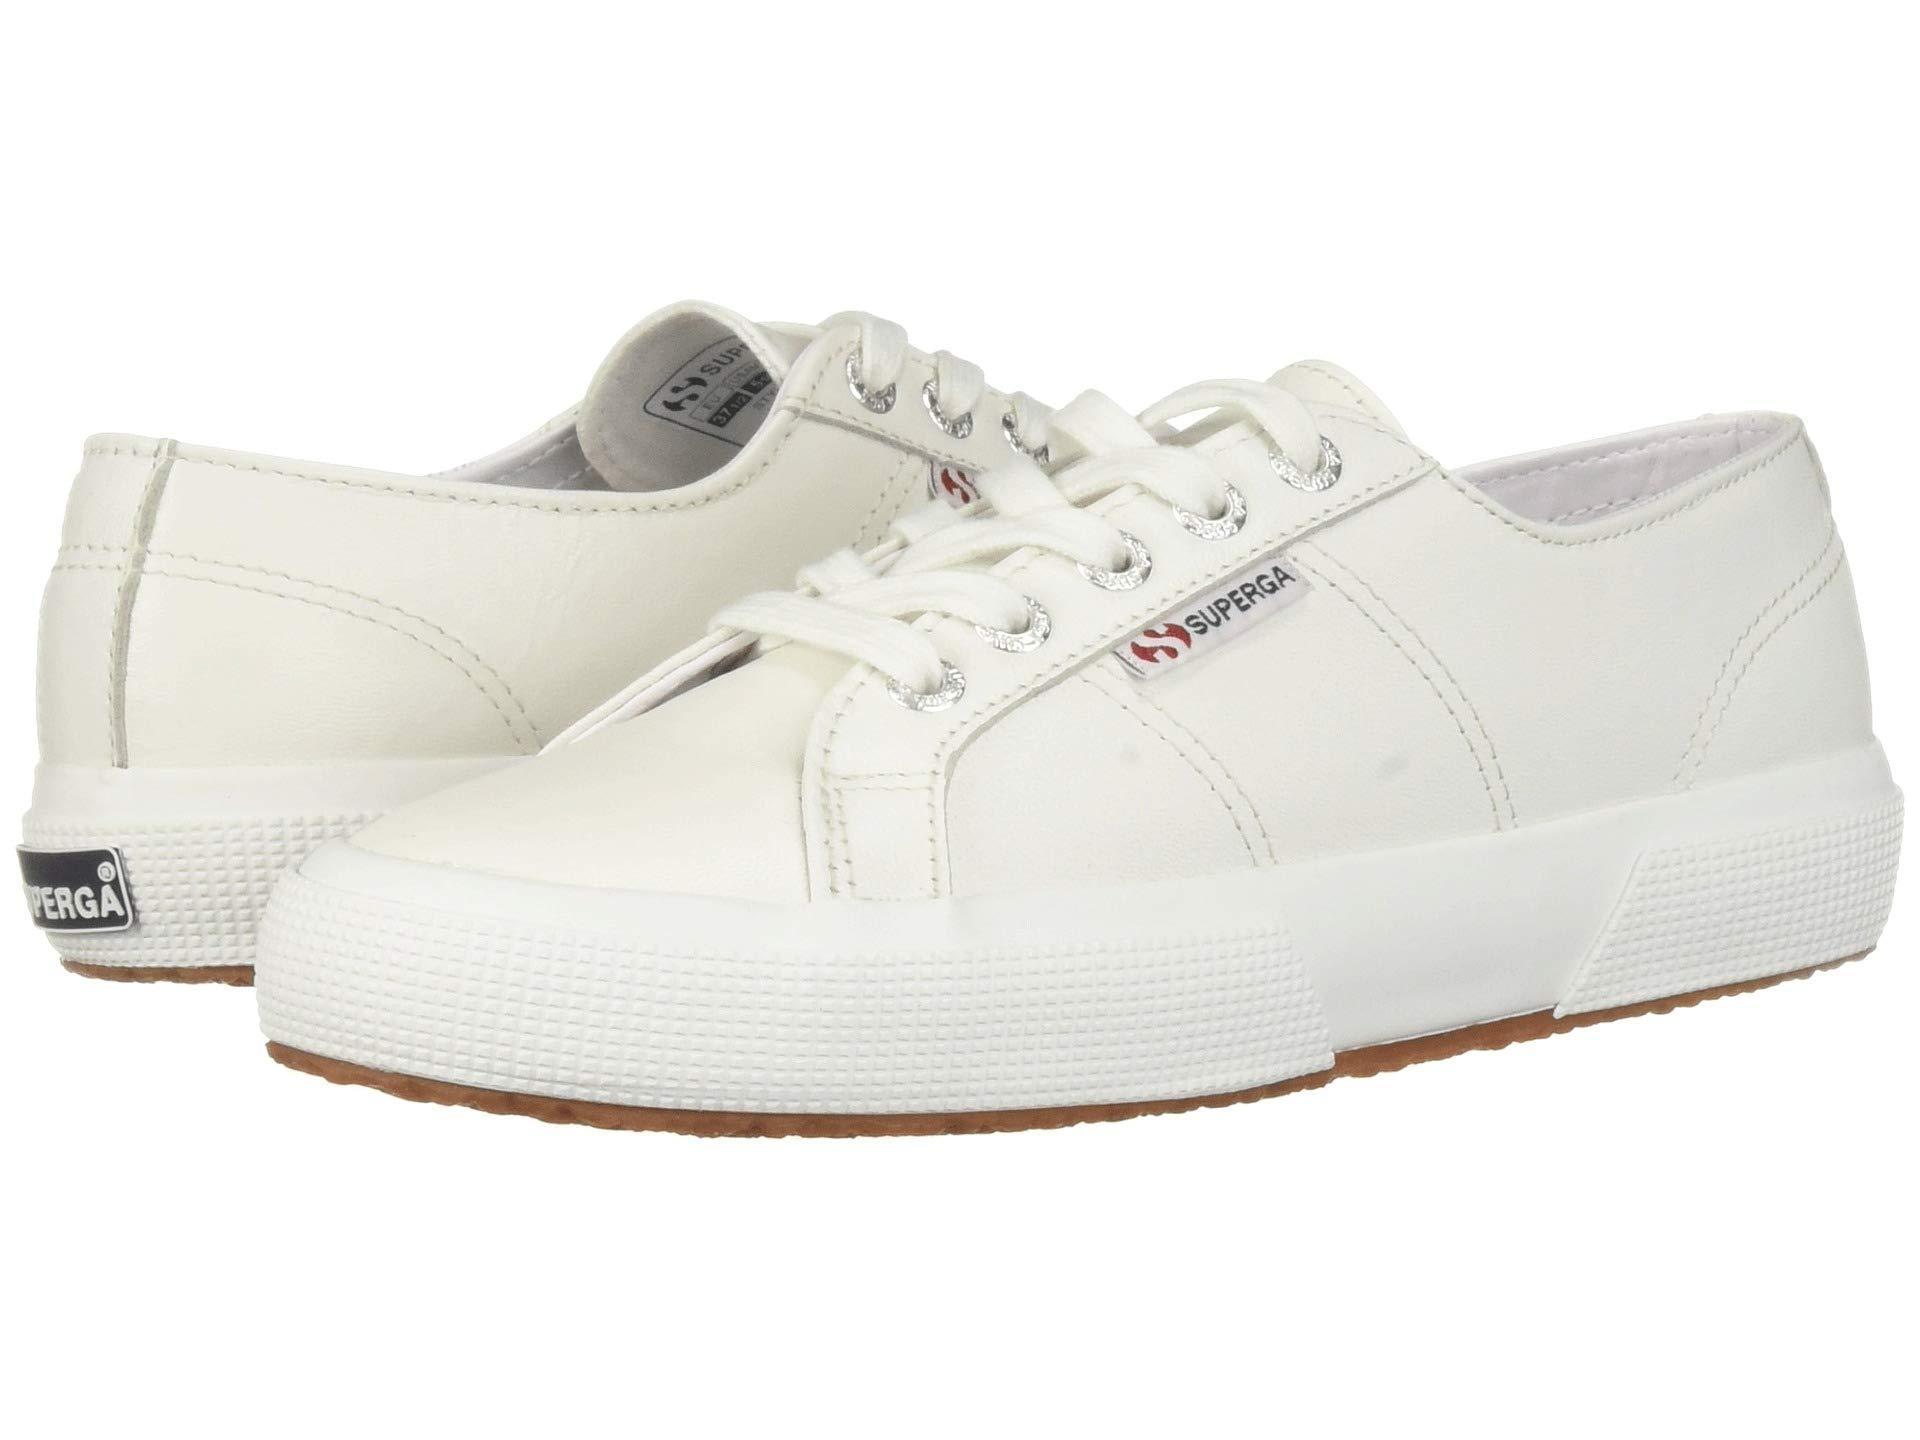 b9b7e6d9339 Superga - White 2750 Nappaleau Sneaker (black) Women s Shoes - Lyst. View  fullscreen